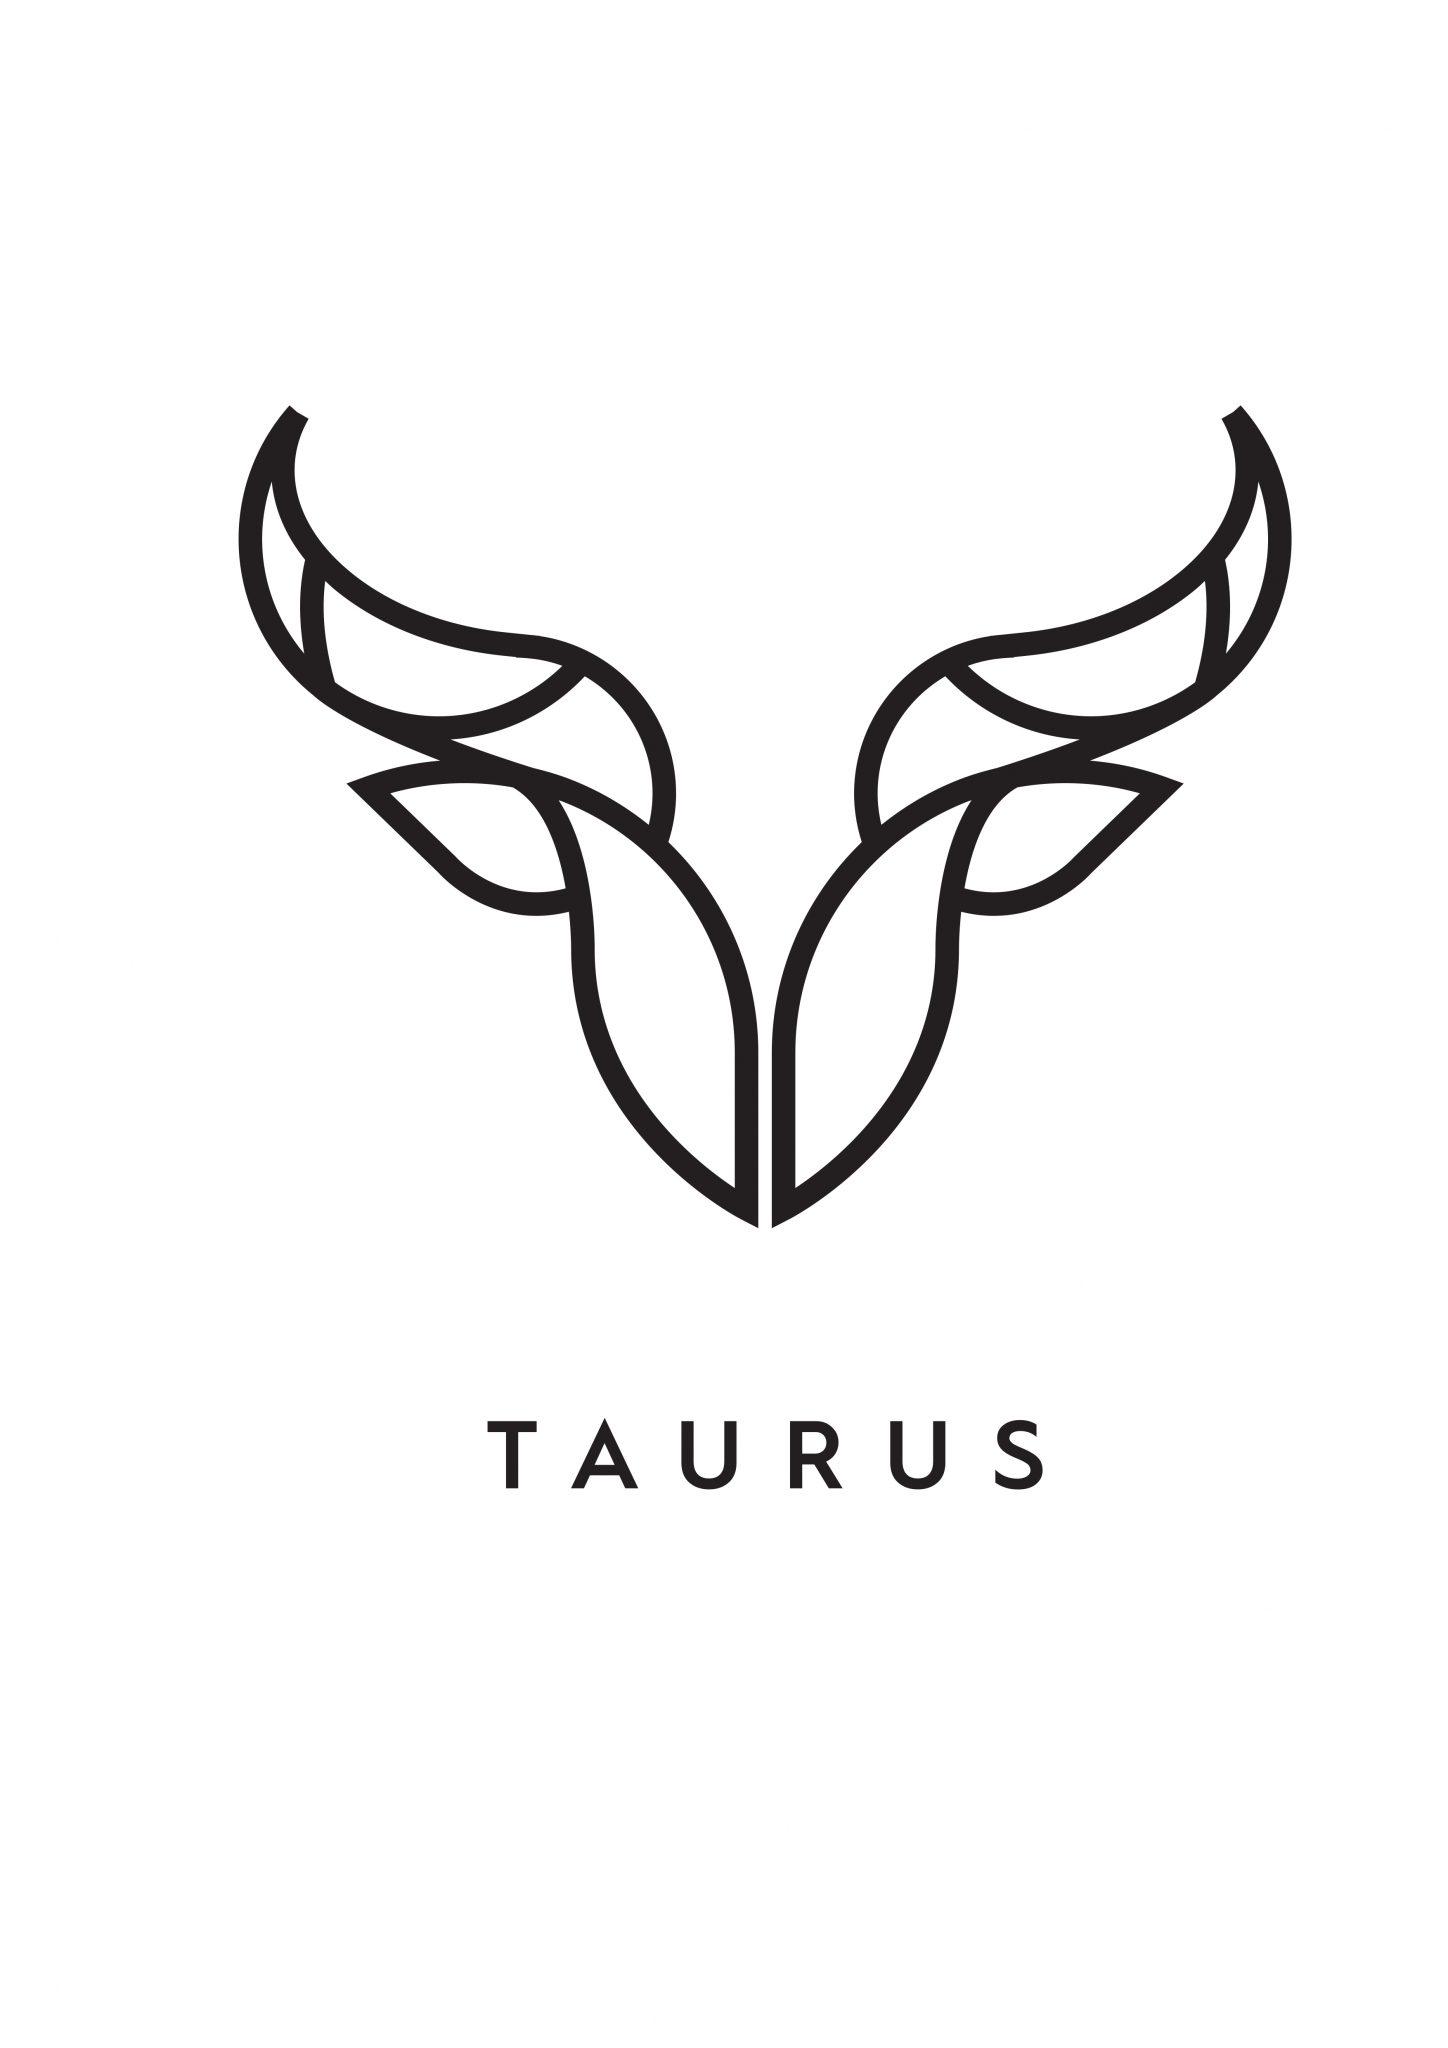 Olariu Alin (Taurus)